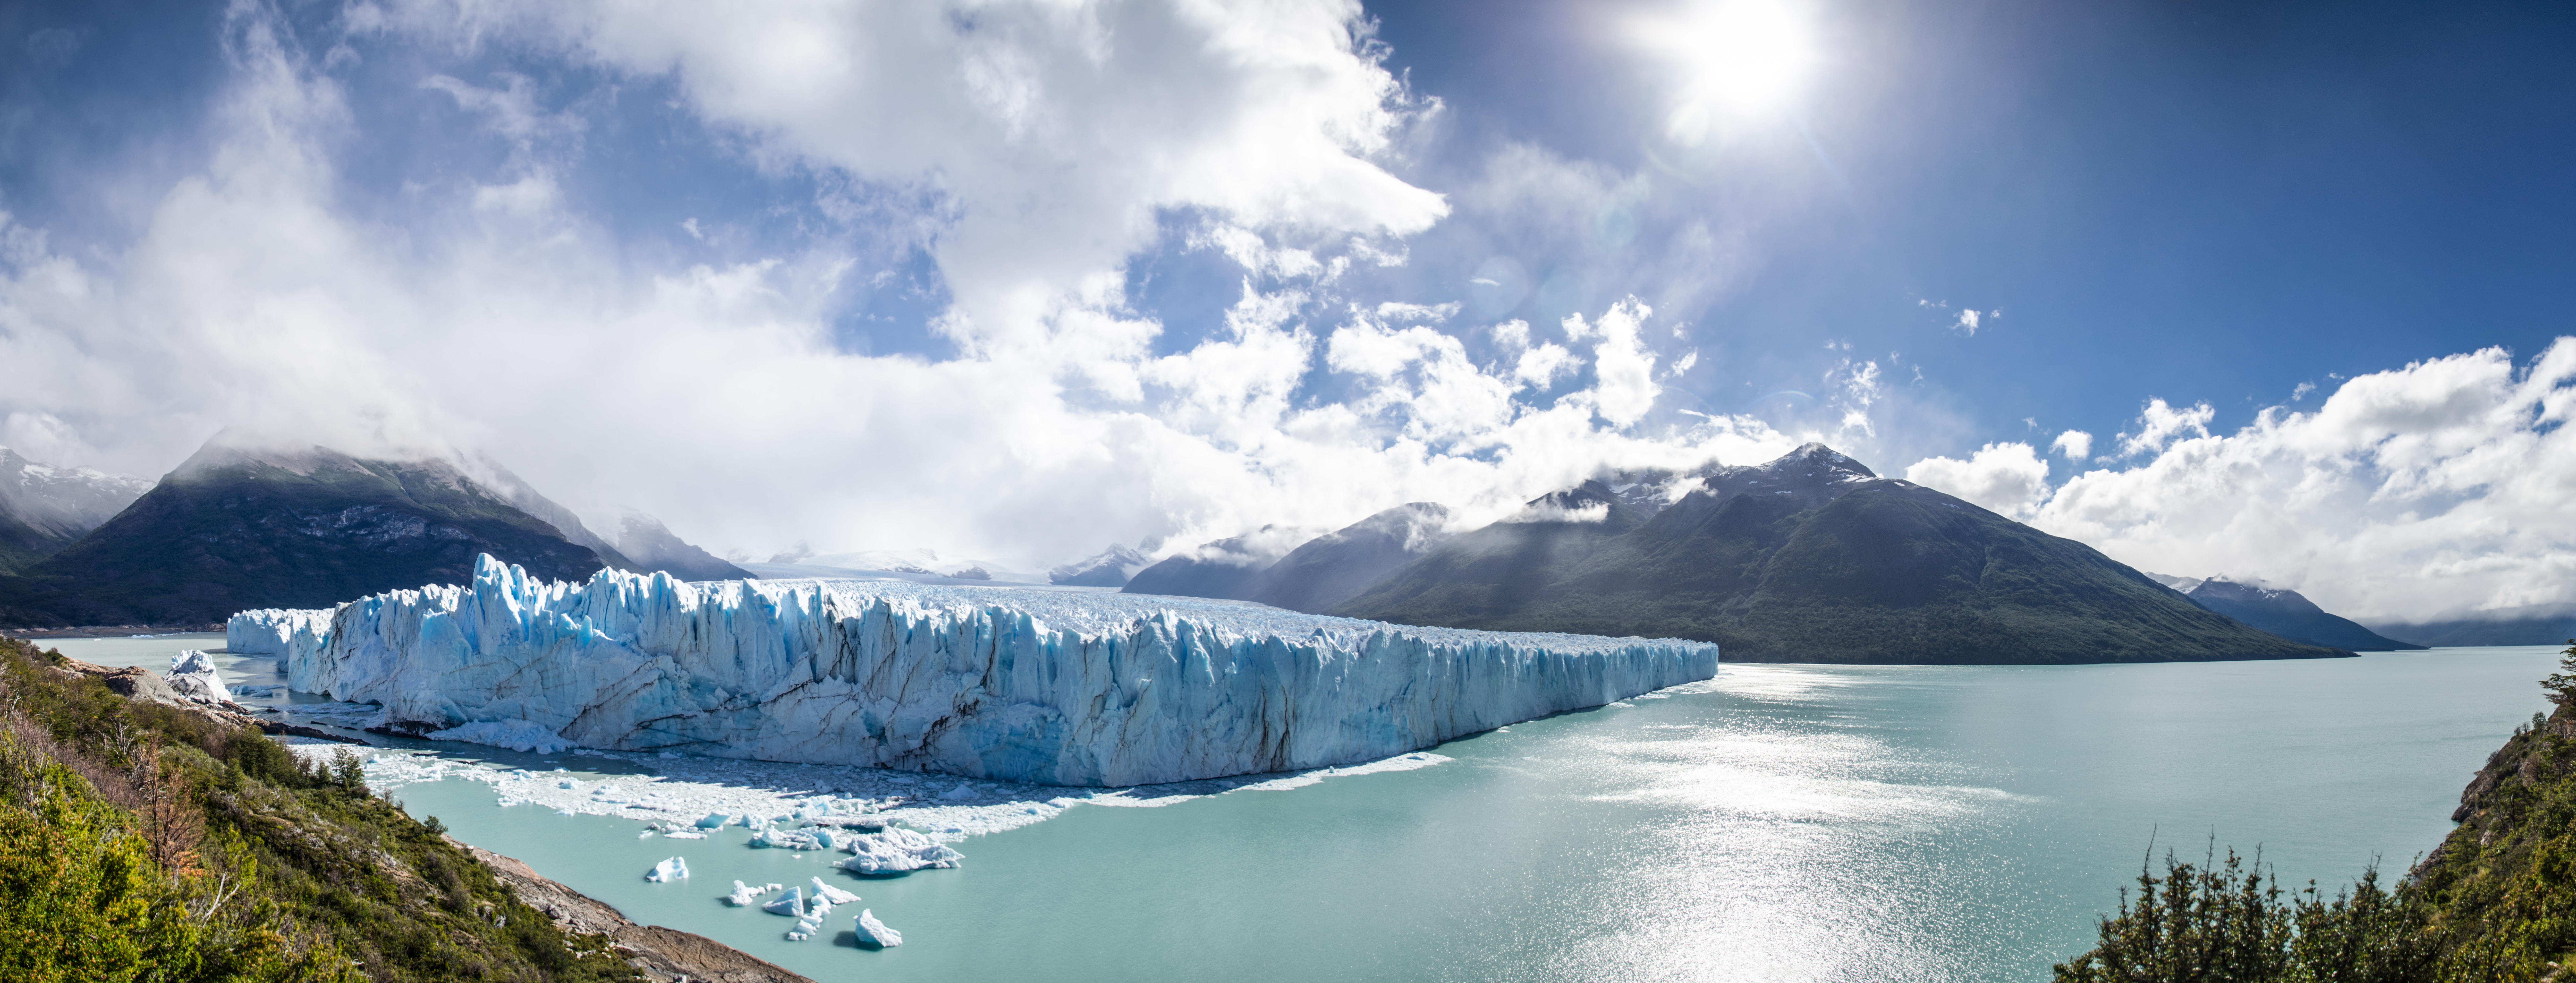 Impressive 250km2 survivor glacier